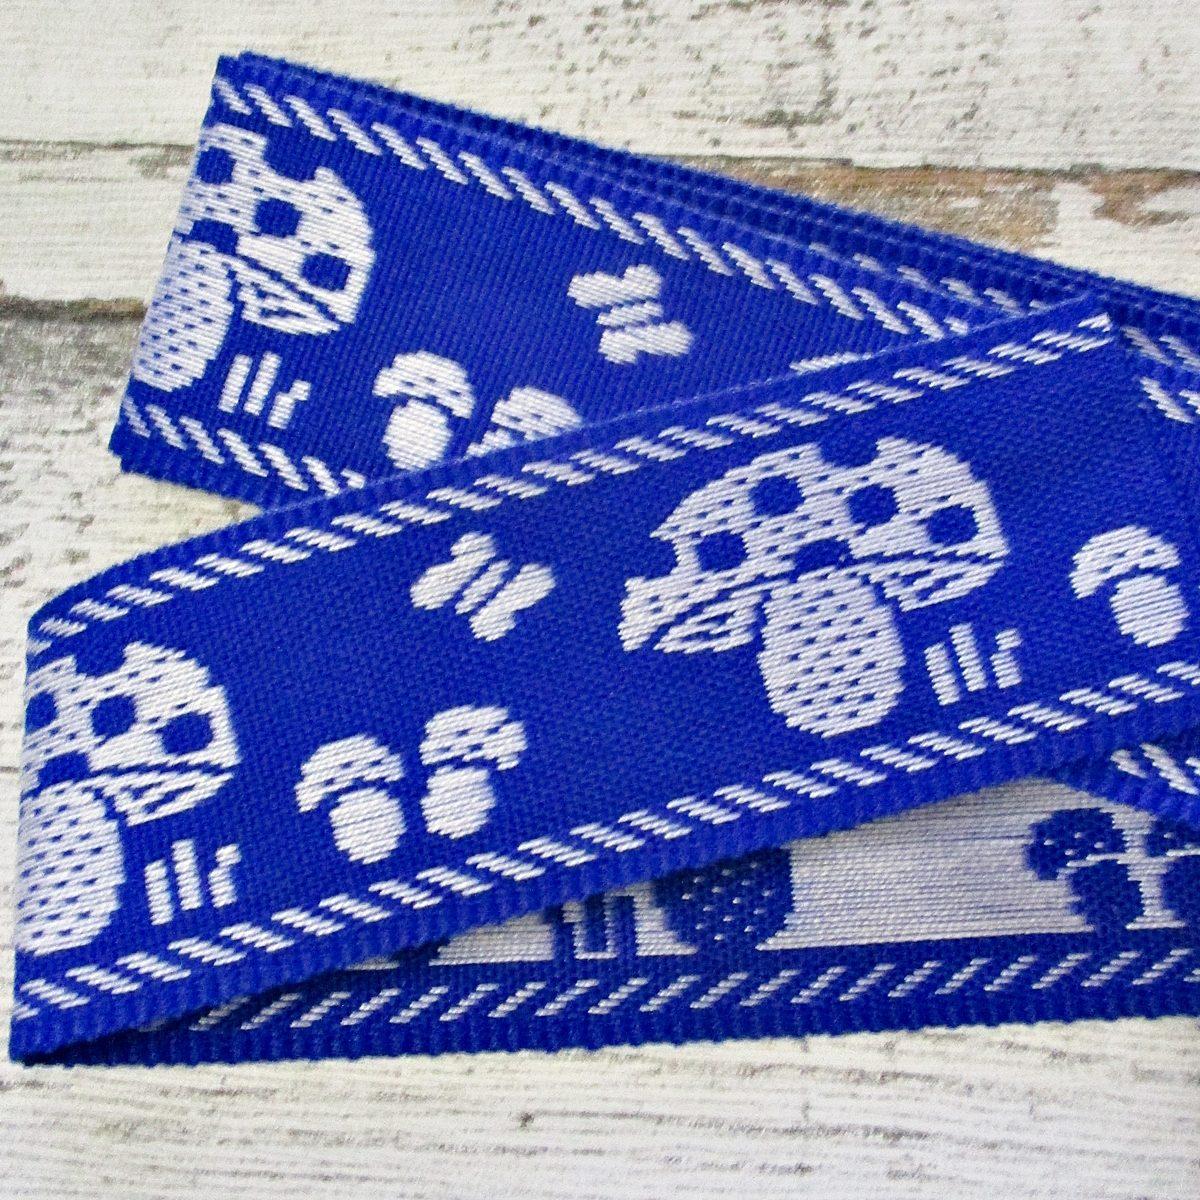 Jeansborte Polyacryl Vintage 70er blau weiß Fliegenpilze Schmetterlinge - Woolnerd